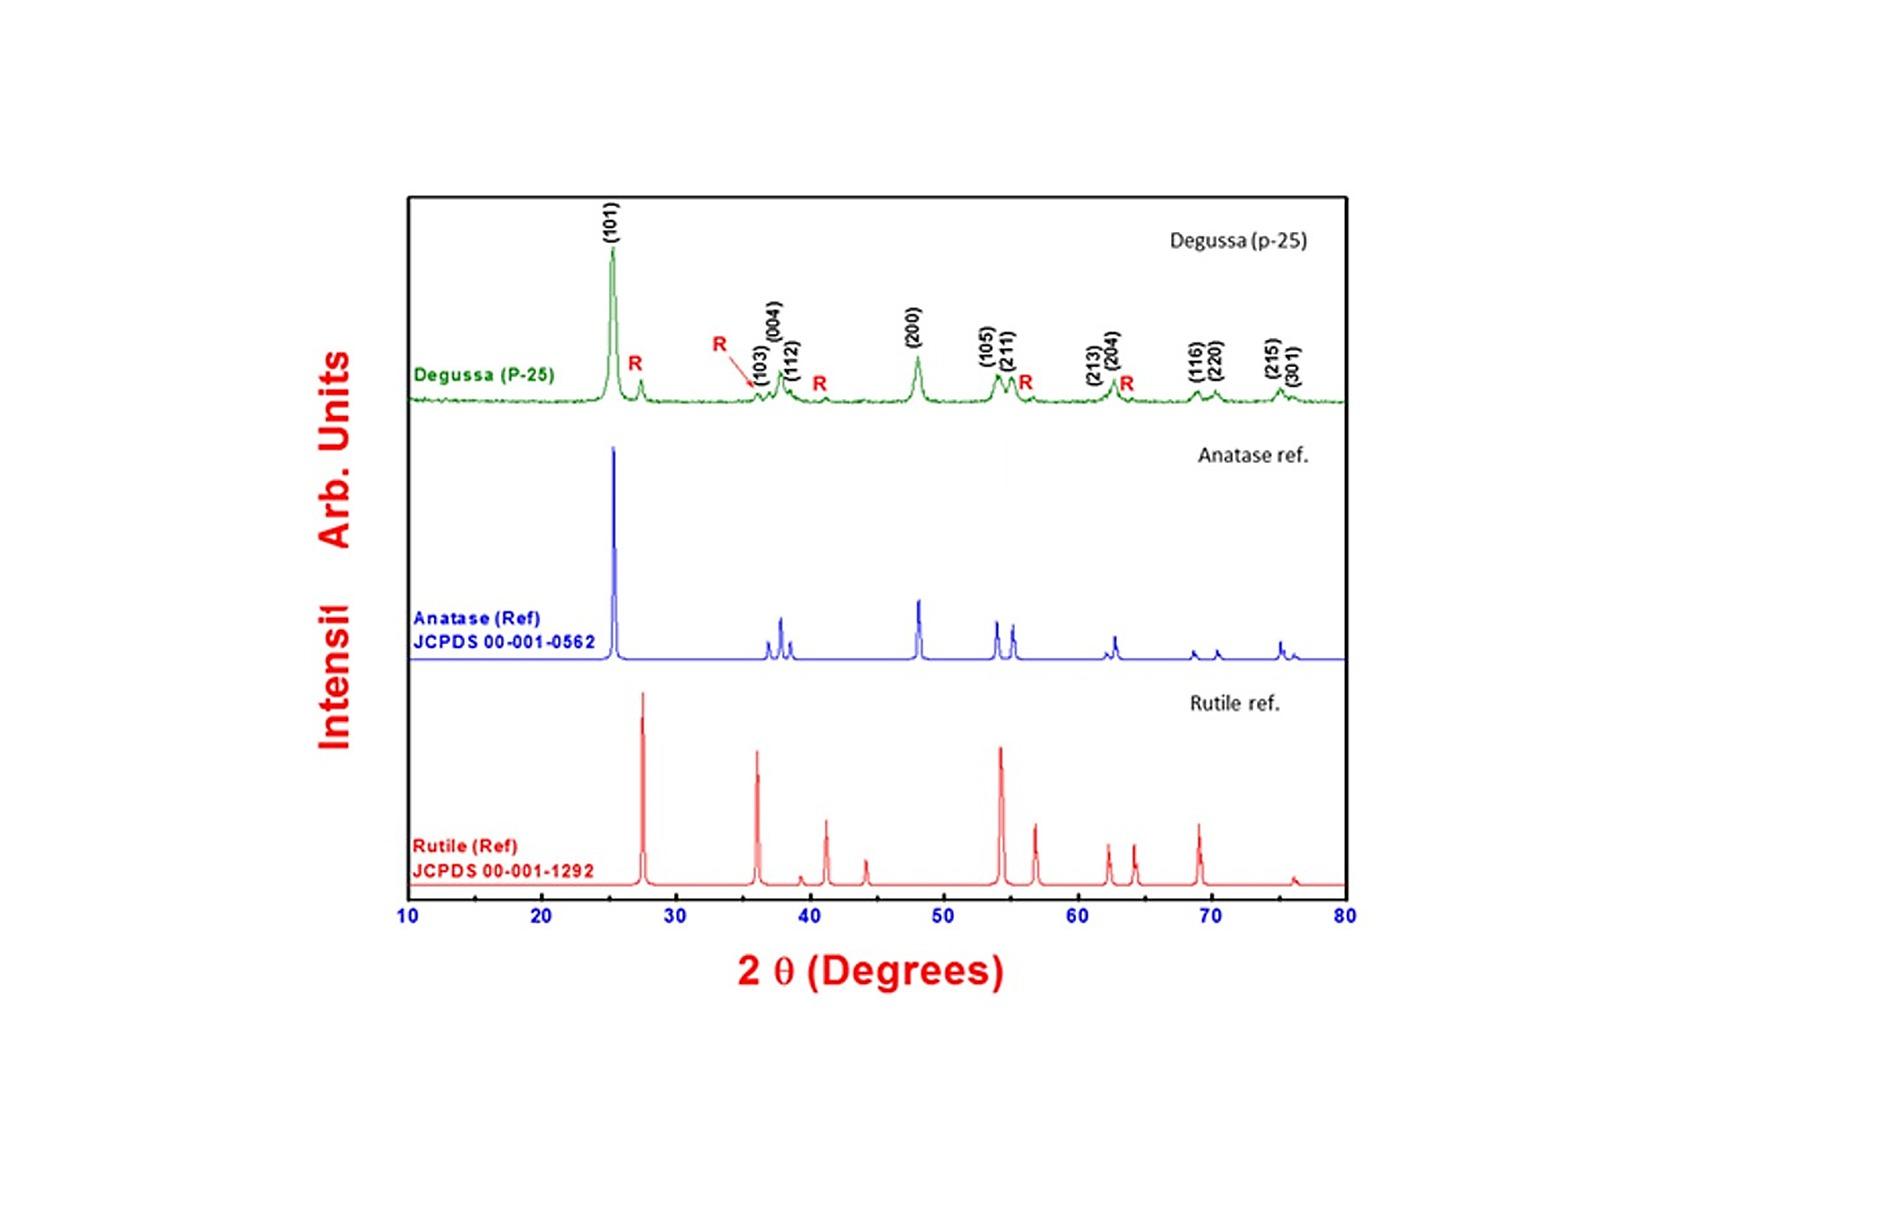 Titanium Dioxide Nanoparticles Induce Endoplasmic Reticulum Stress Np Sensor Tester Wiring Diagram X Ray Diffraction Xrd Data Of Tio2